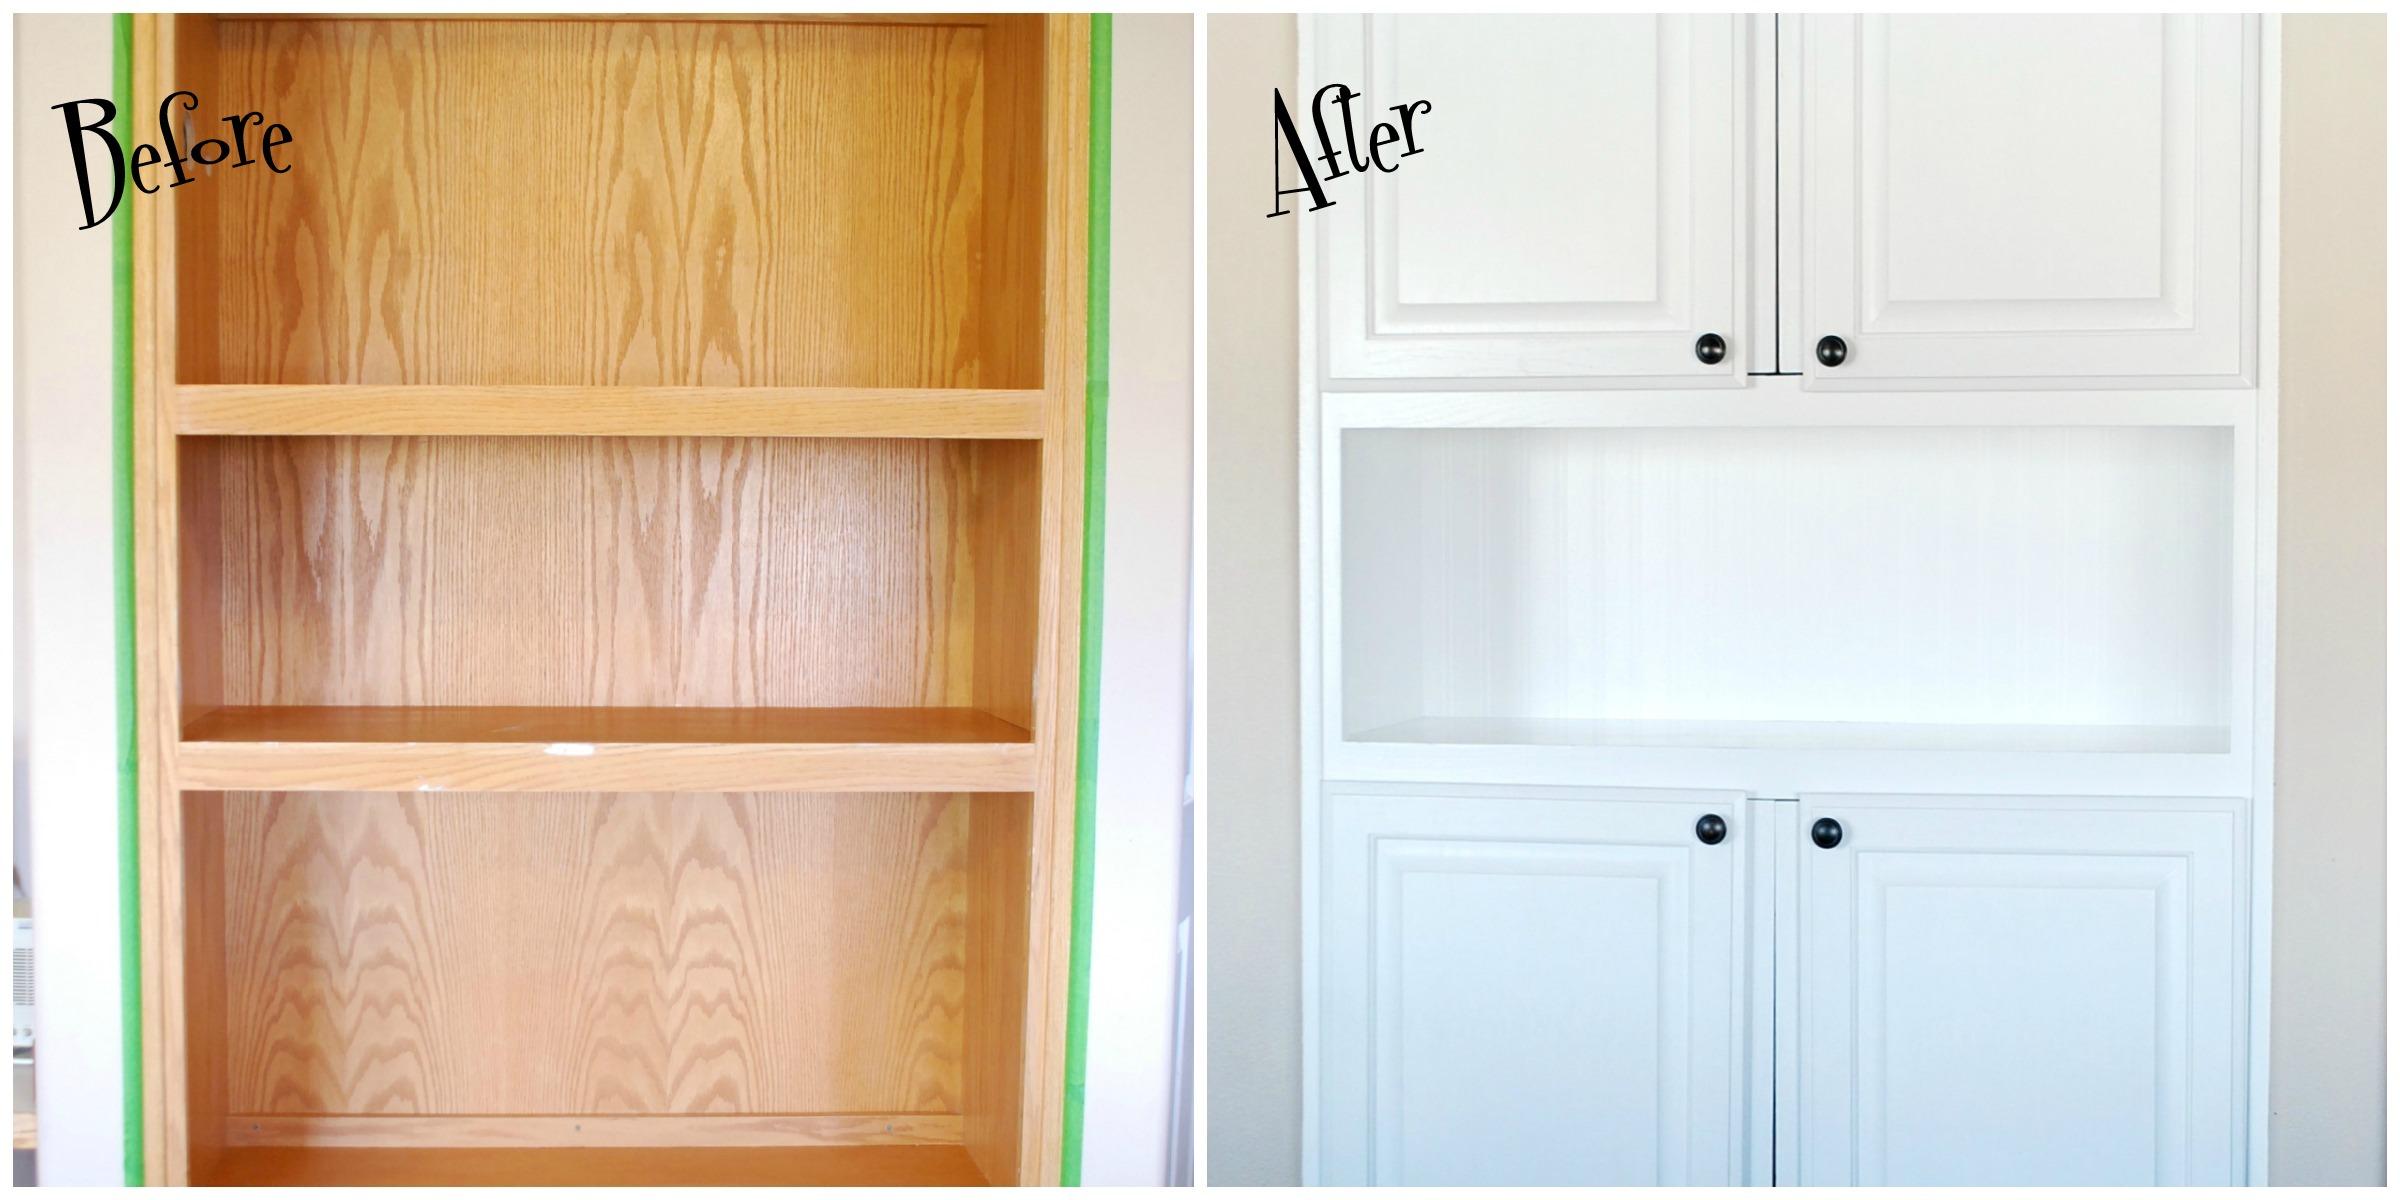 Diy Beadboard Wallpaper Cabinet Doors Diy Ideas